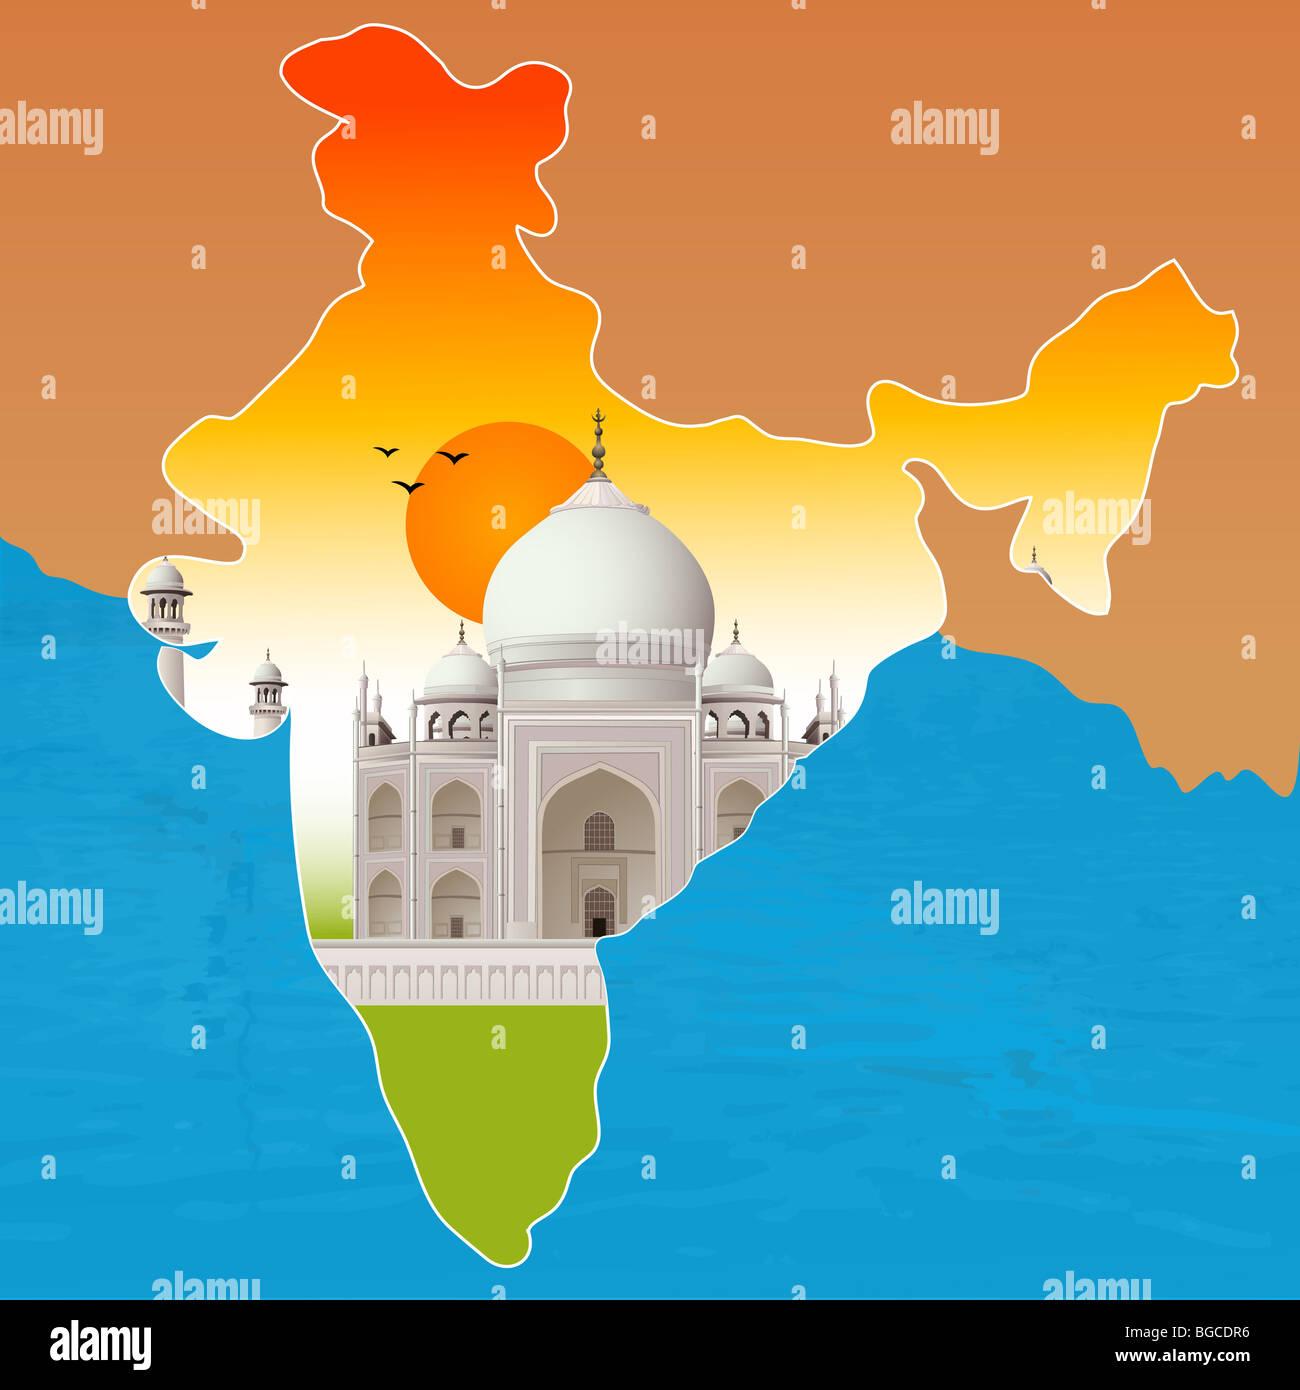 Carte De Linde Agra.Taj Mahal Agra Contour Carte De L Inde Banque D Images